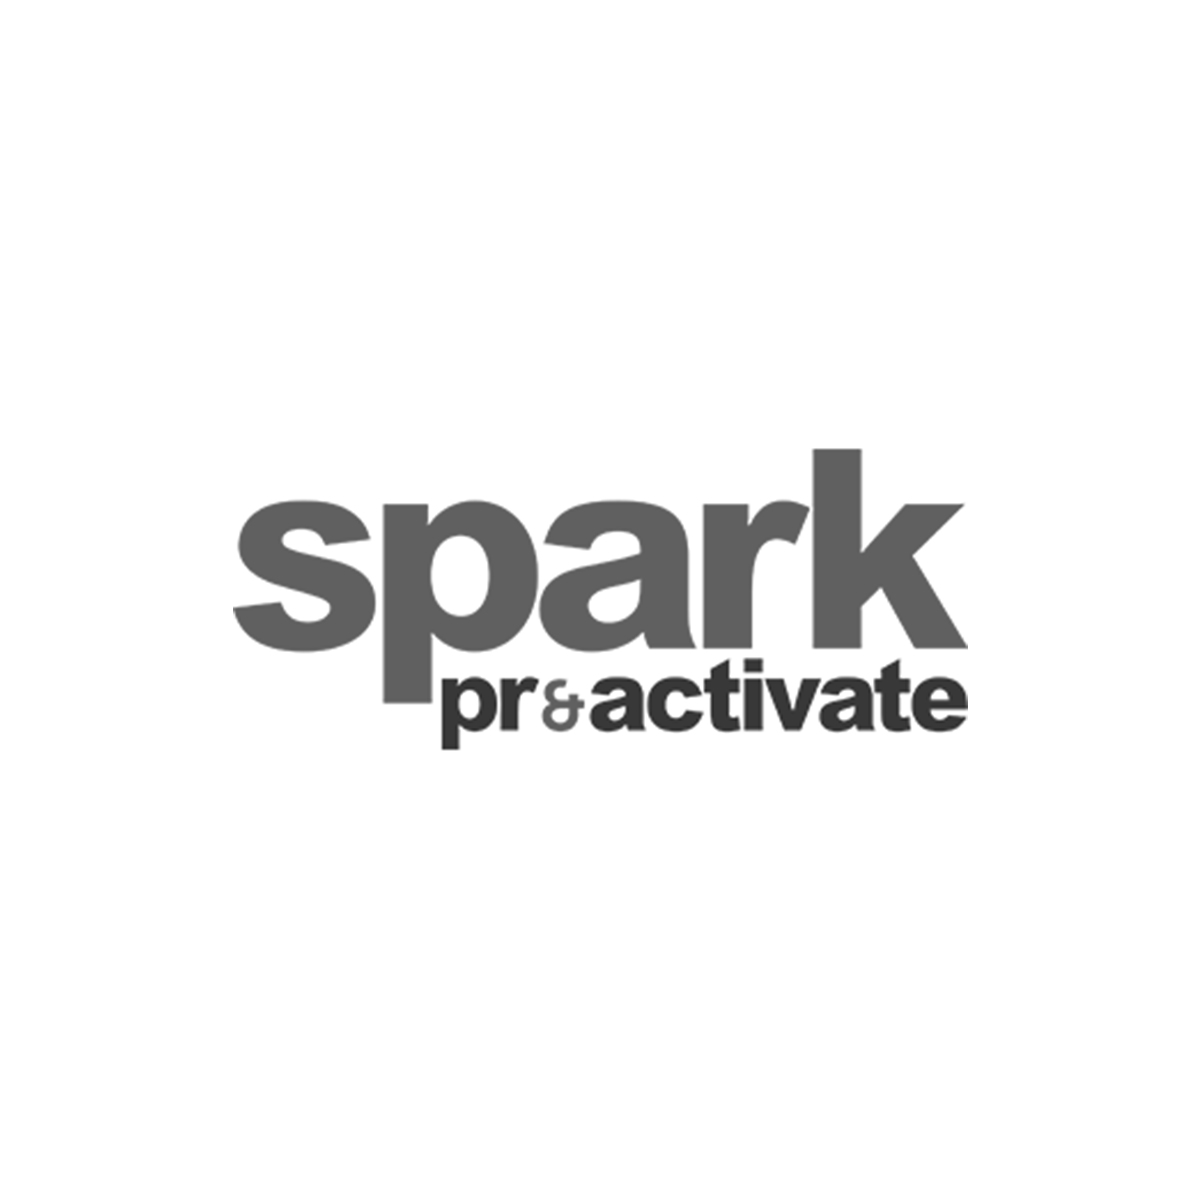 SparkPR.jpg